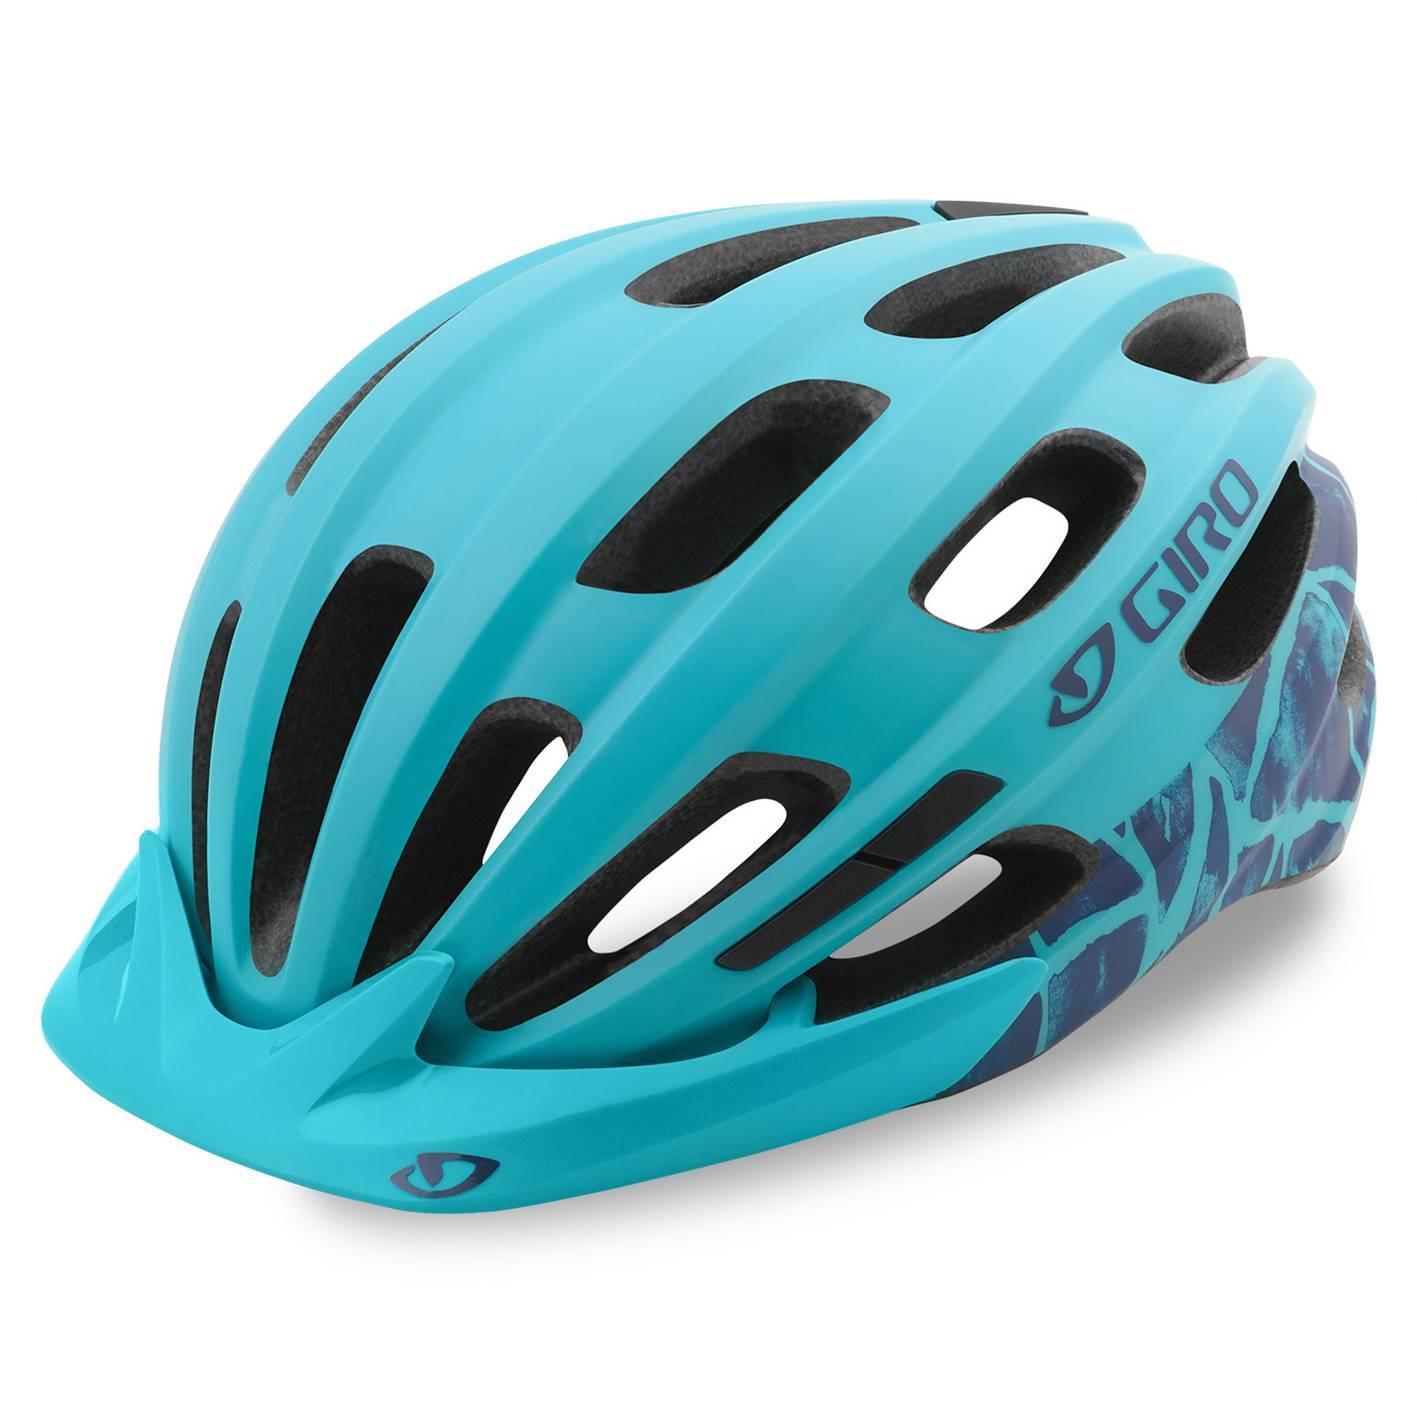 Capacete Giro Vasona - Azul - Tam 50-57cm